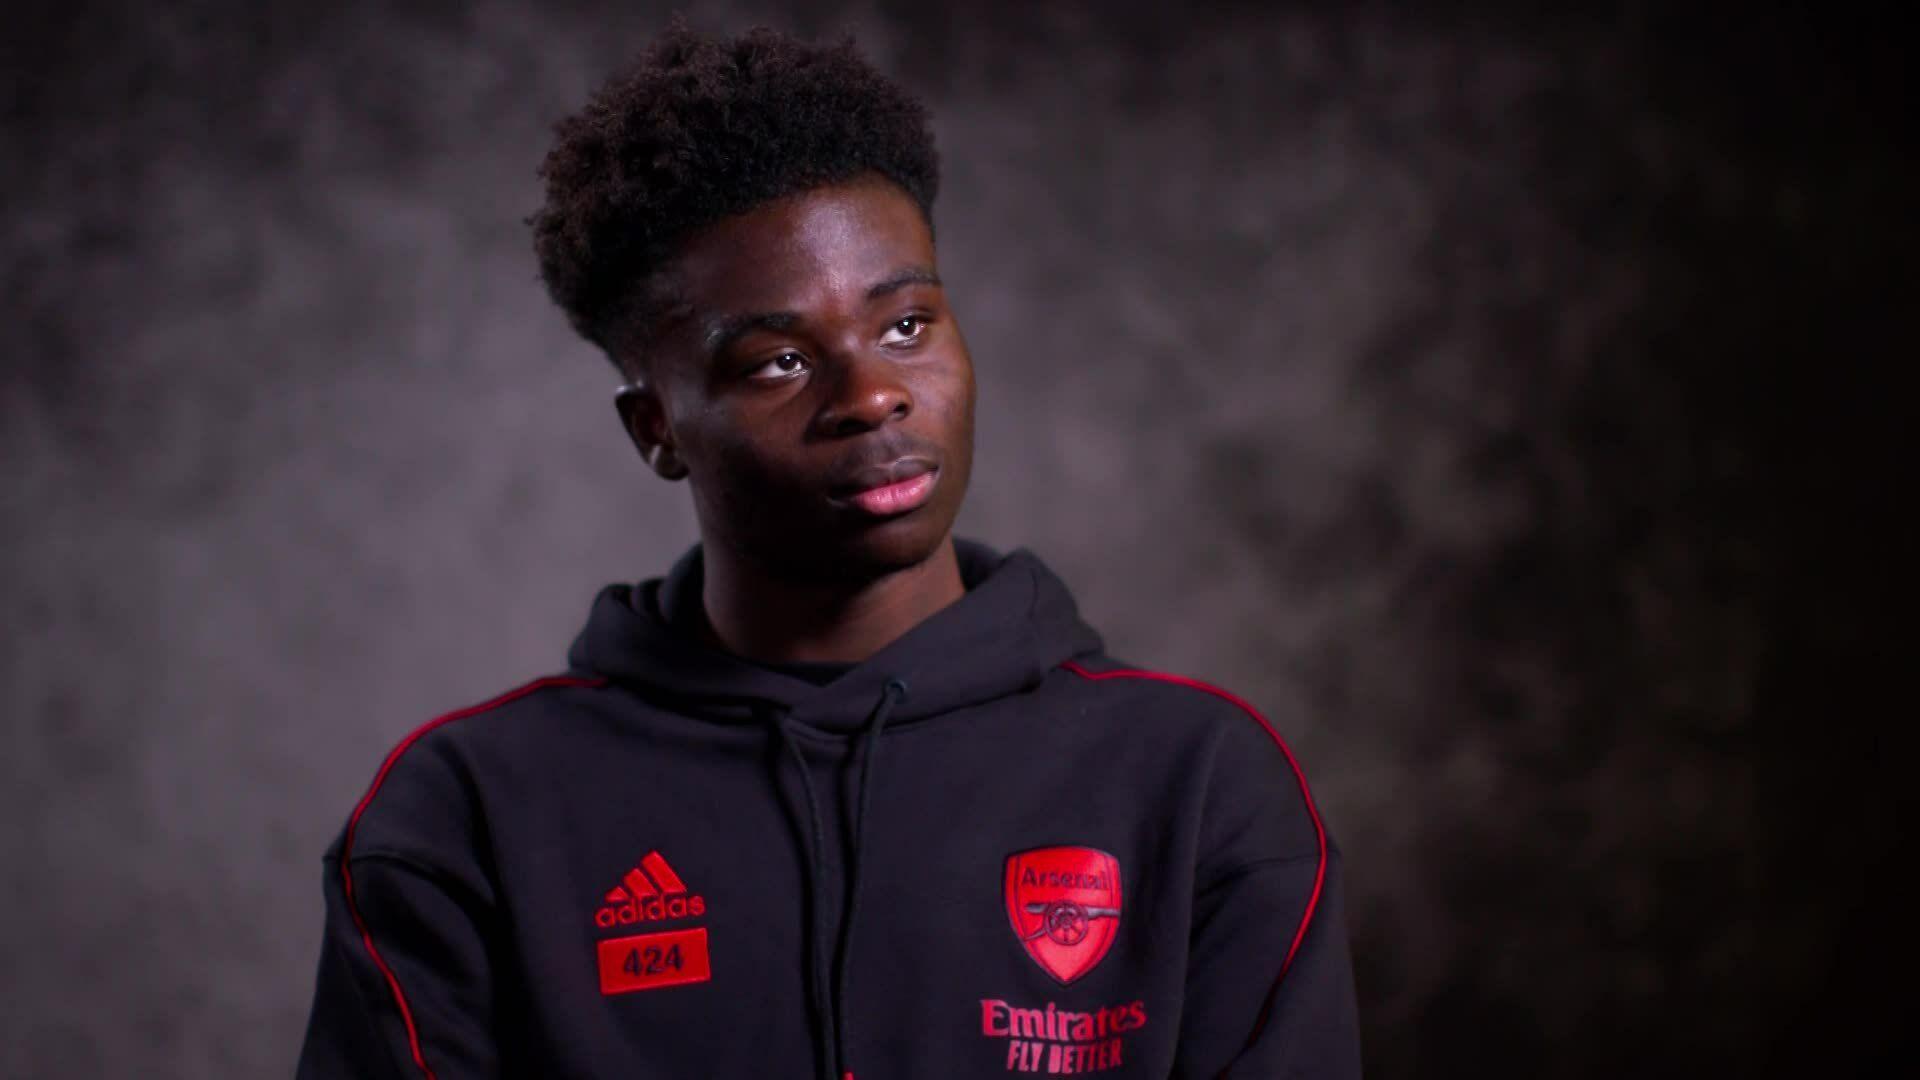 Arsenal's inspiring academy